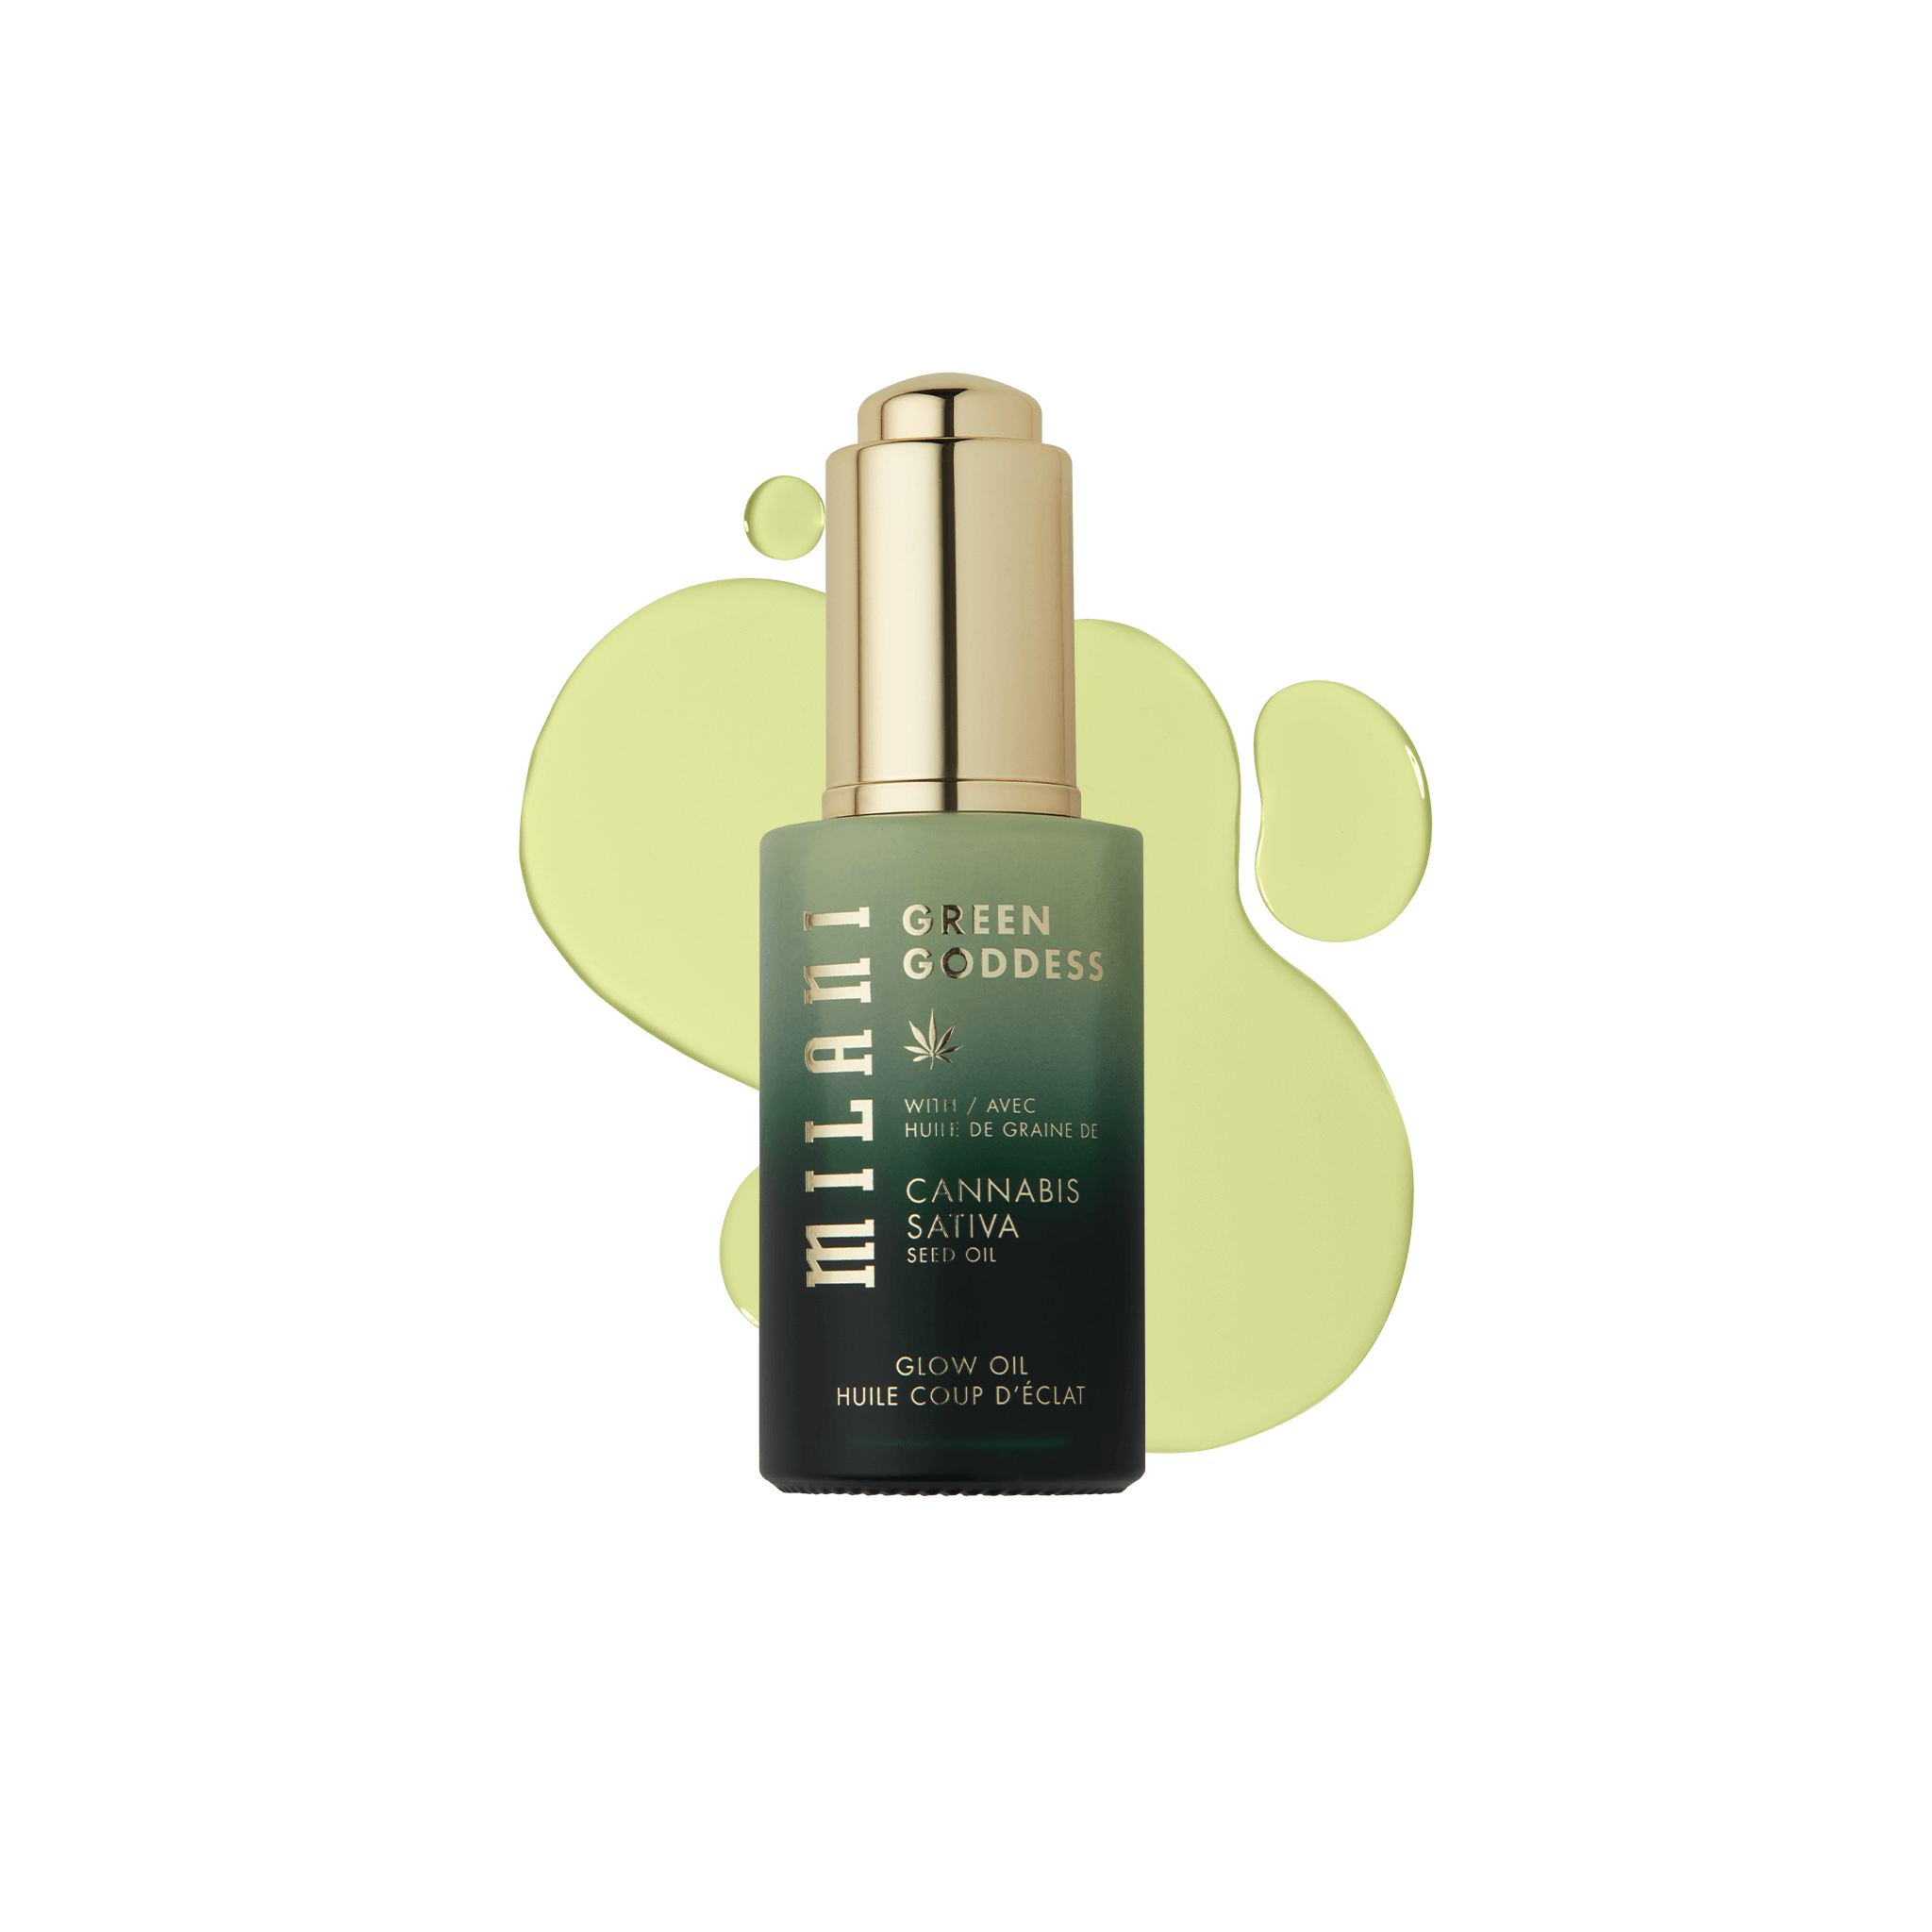 Milani - Green Goddess Glow Oil